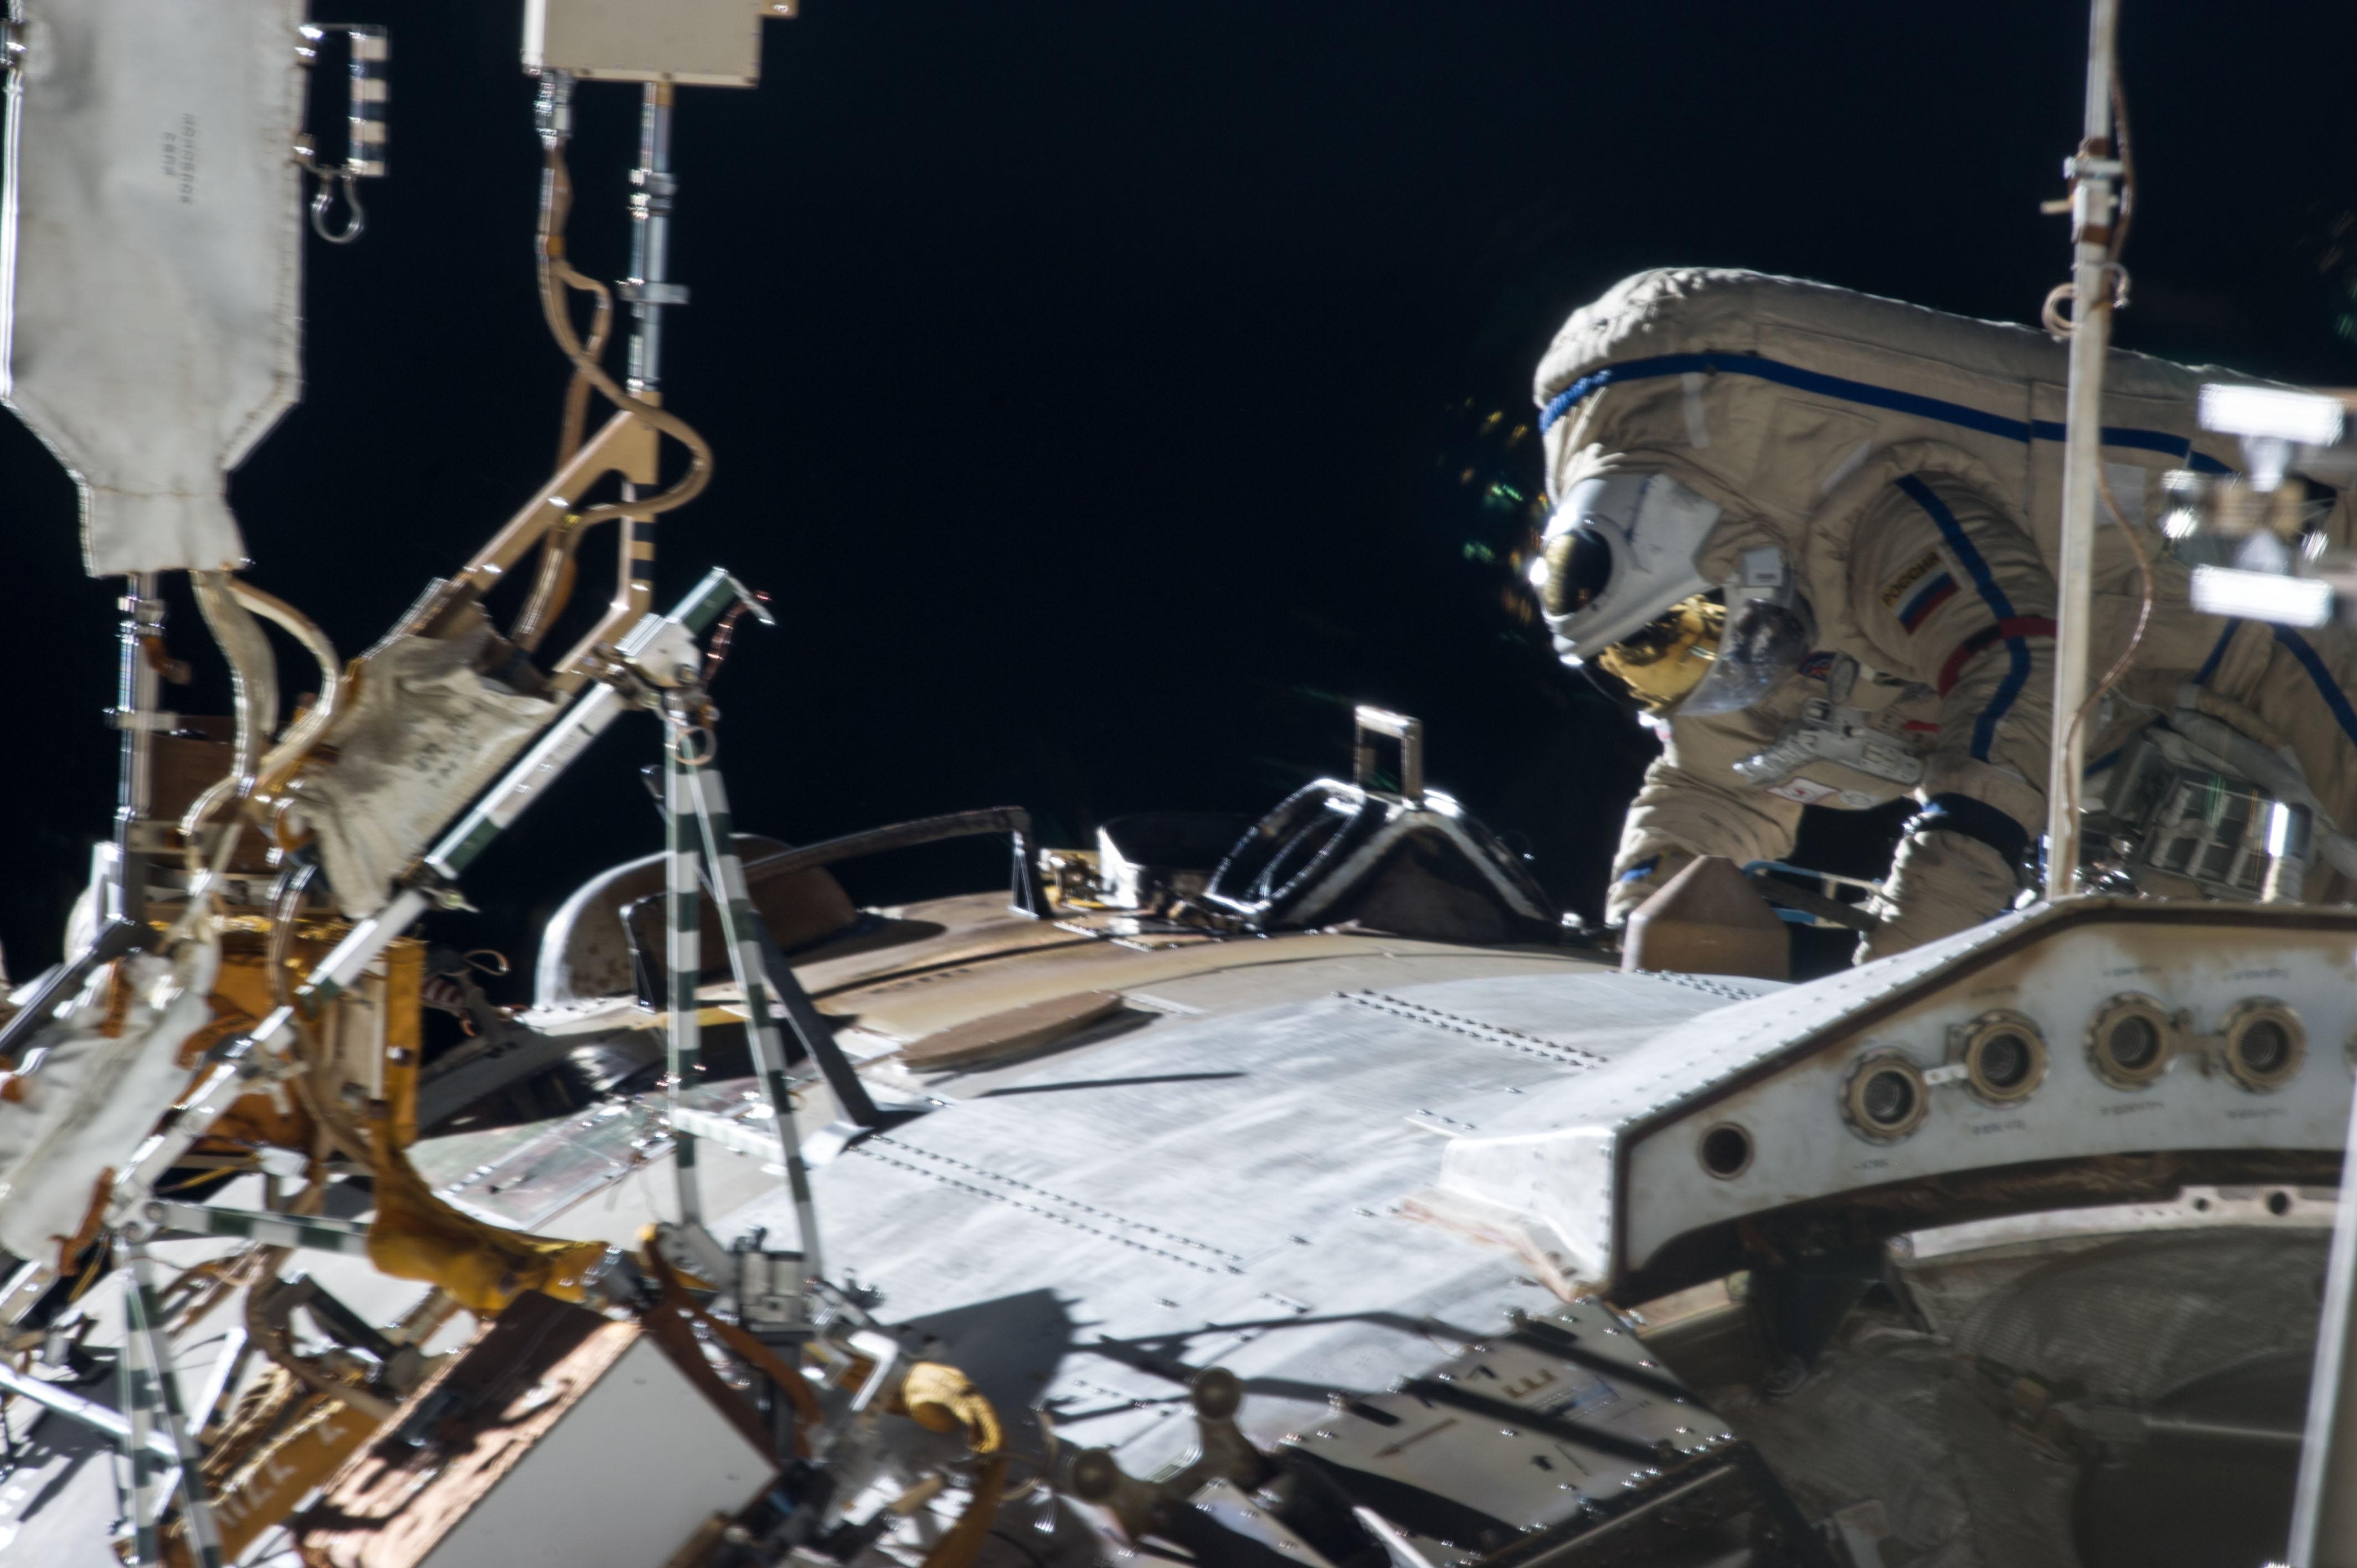 Expedition 35 Spacewalk to Upgrade Exterior